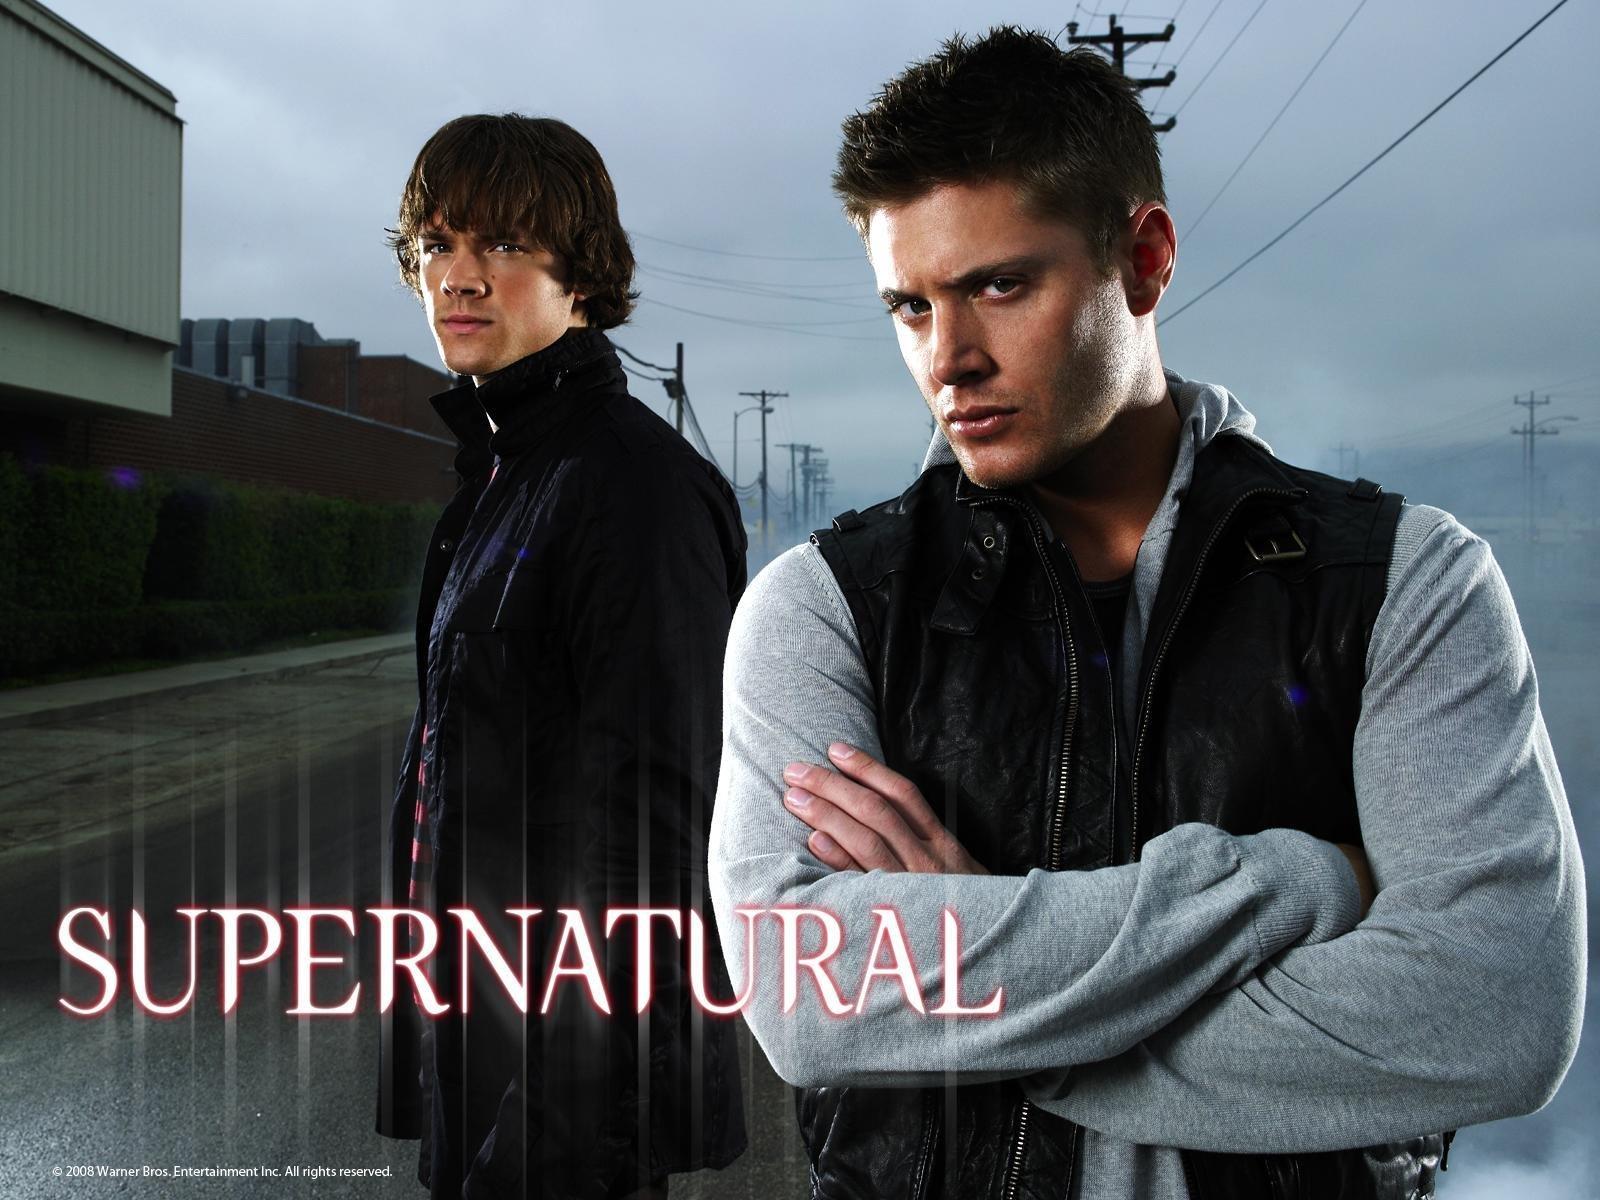 Amazon co uk: Watch Supernatural - Season 4 | Prime Video